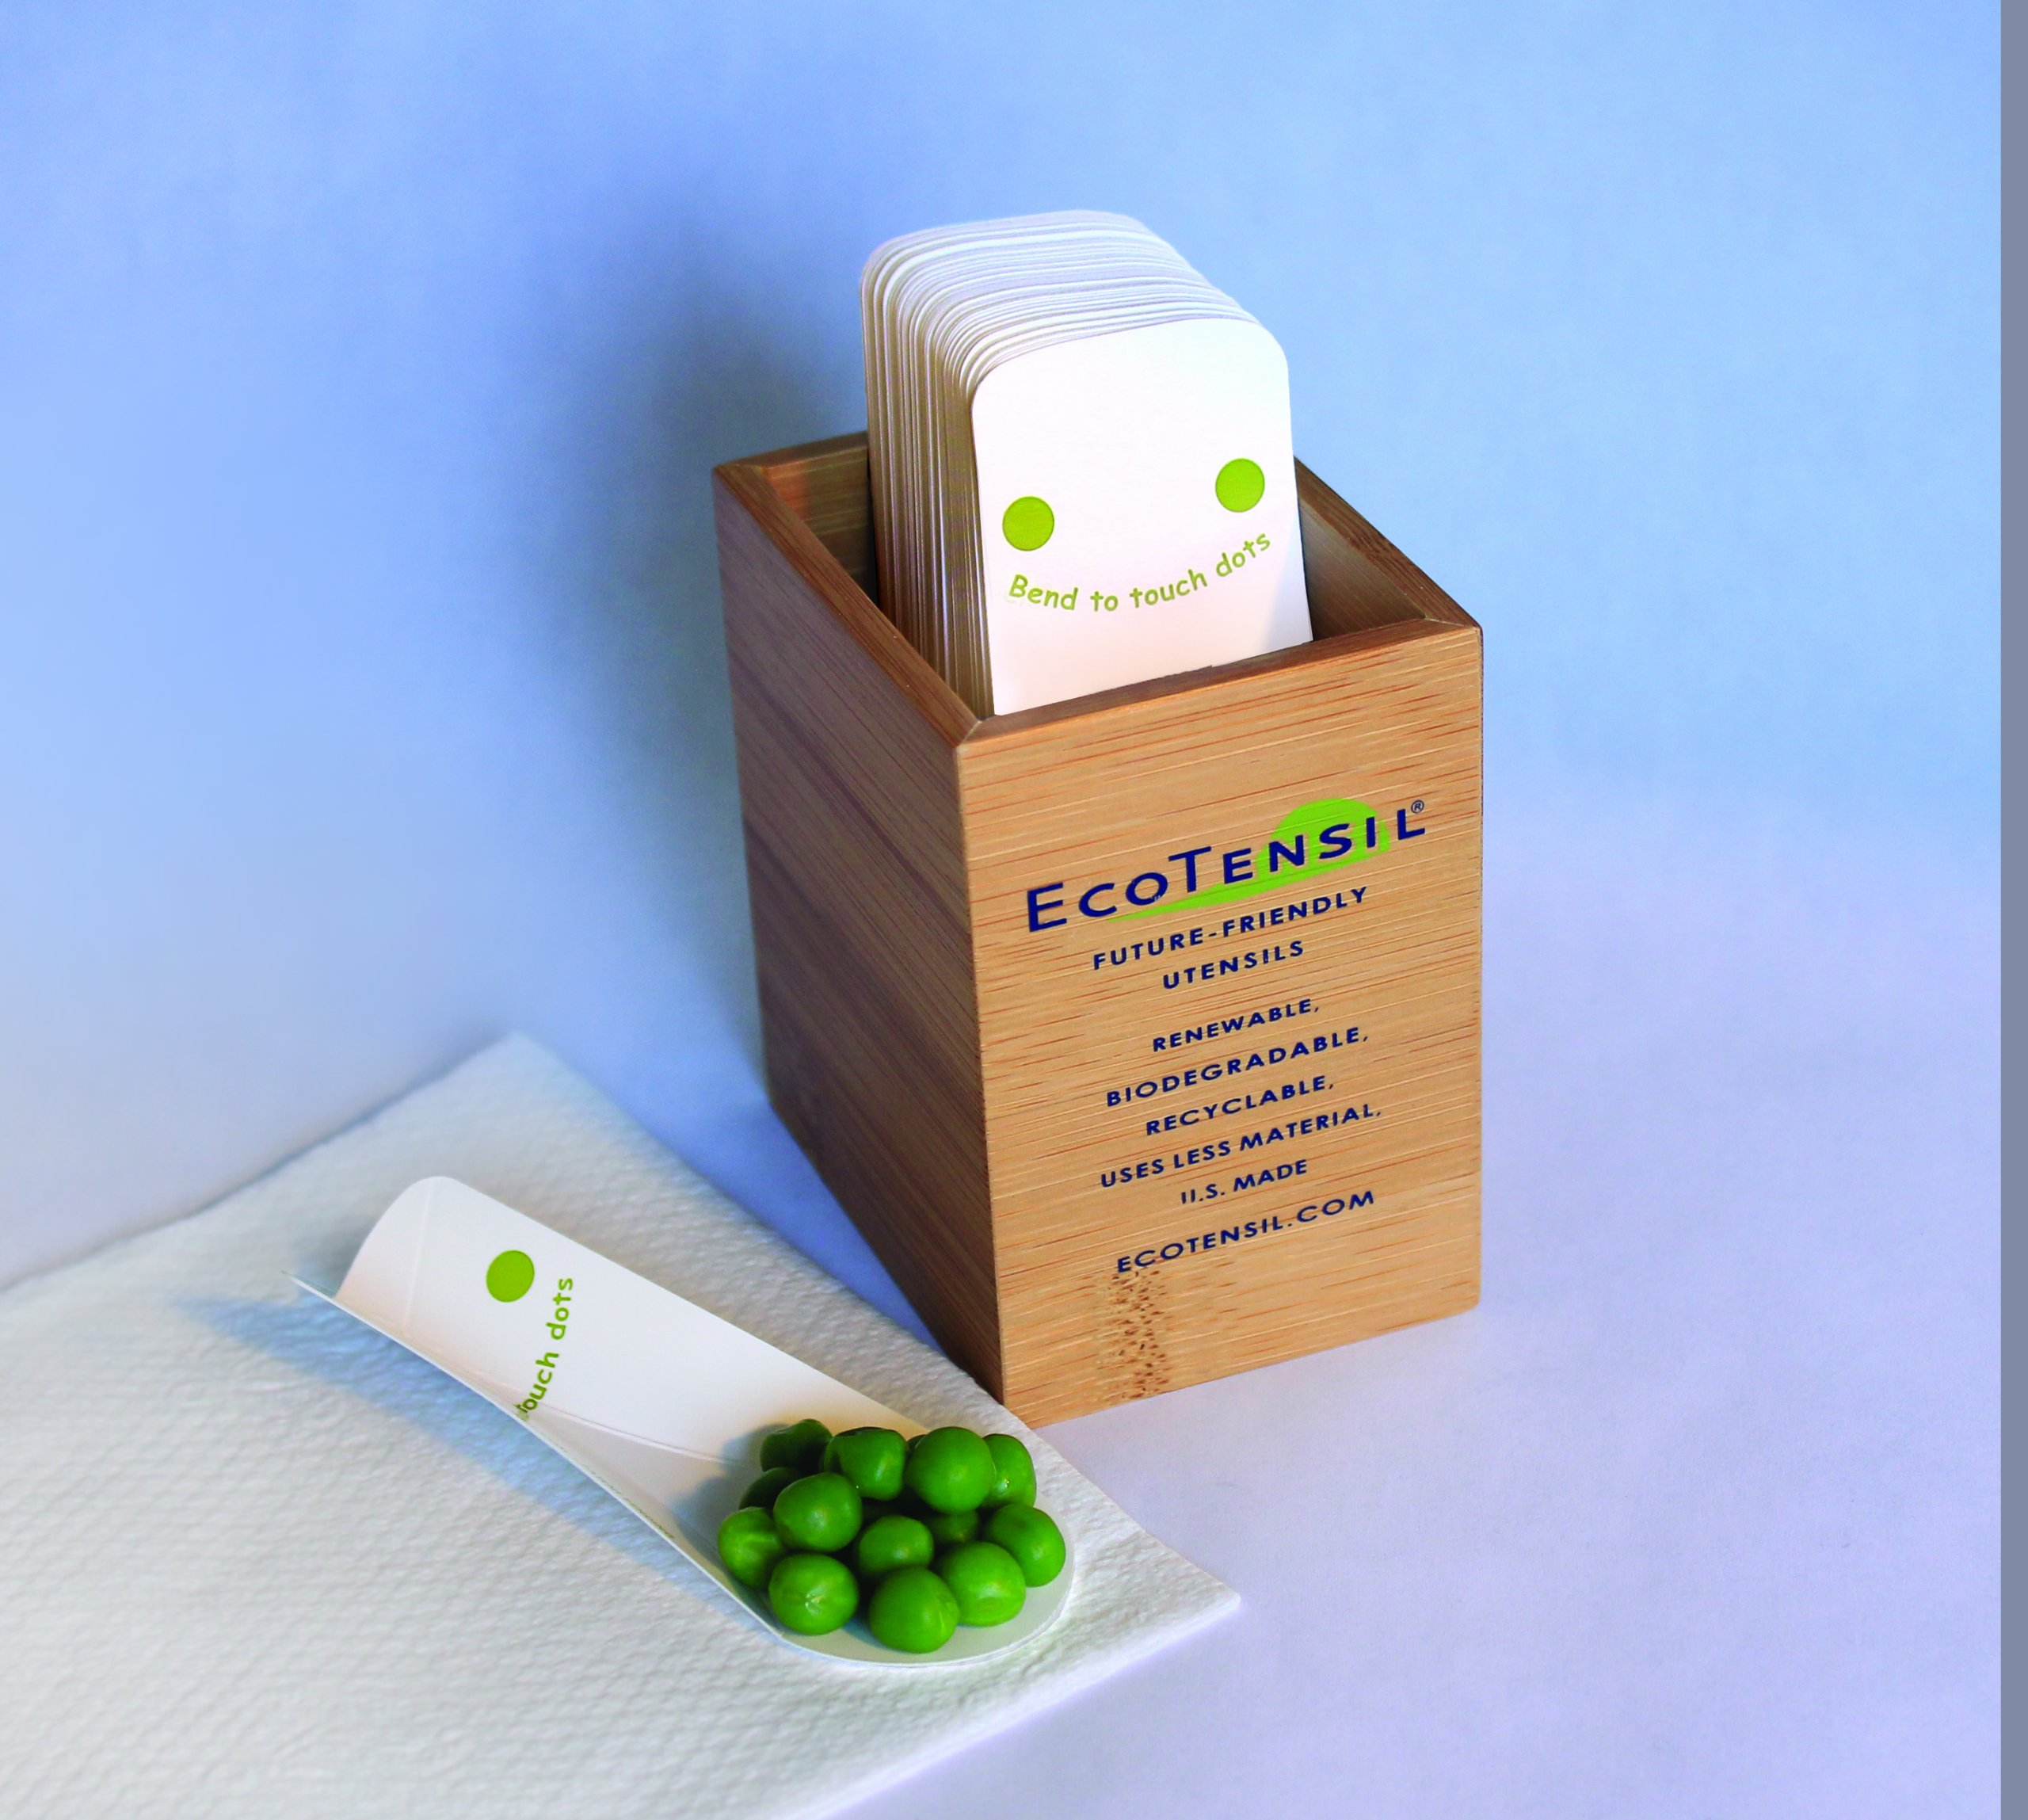 EcoTaster Mid 1,000 Biodegradable Tasting Spoons w/Dispenser